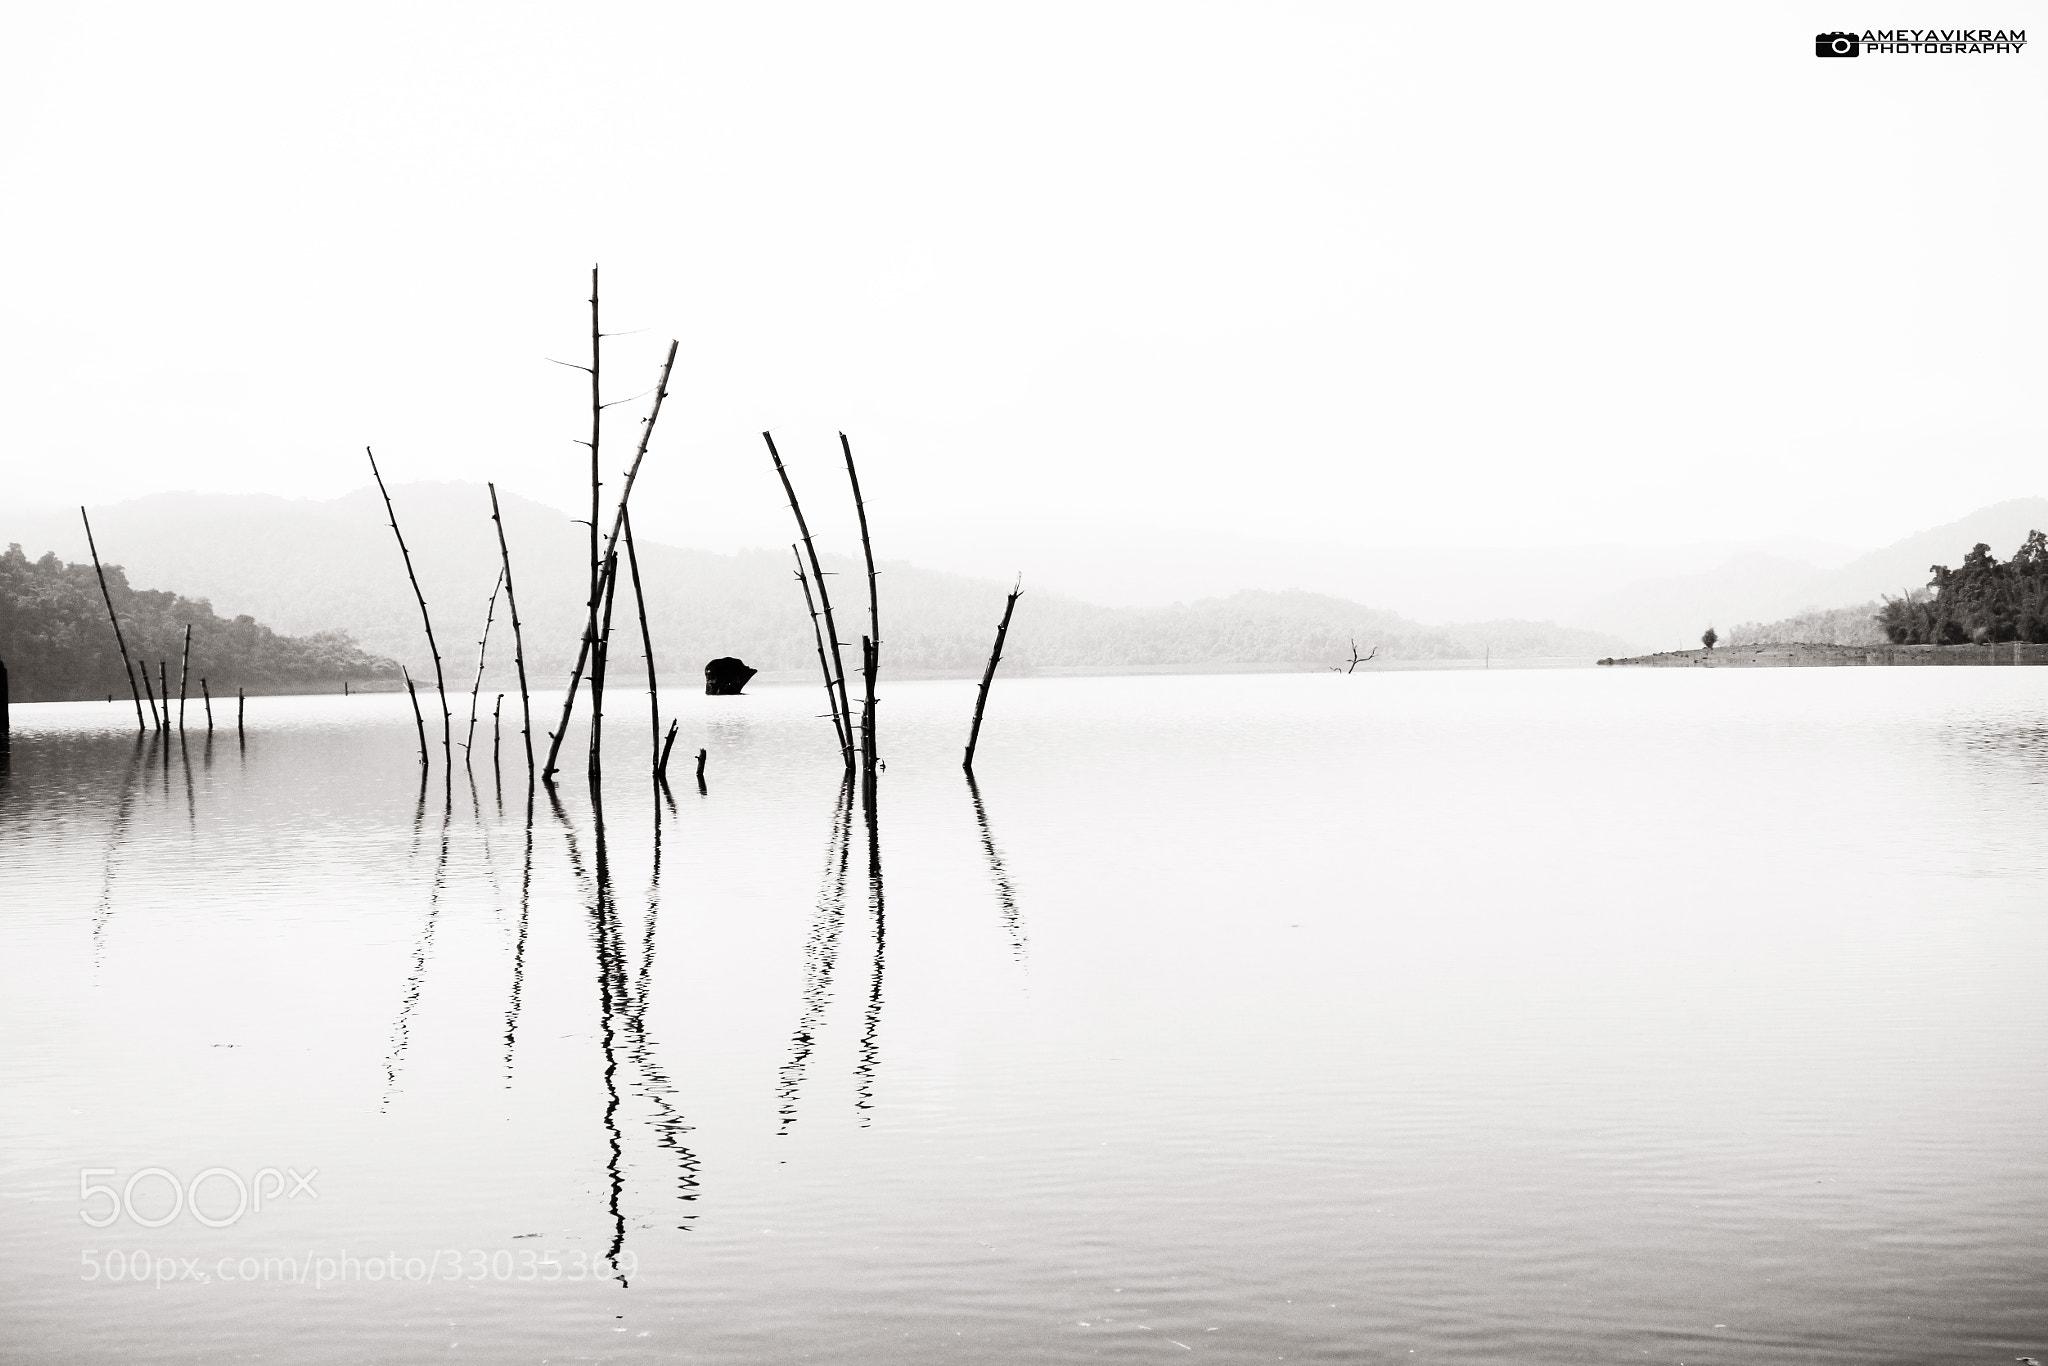 Photograph Less is more by Ameyavikram Mahalingashetty on 500px